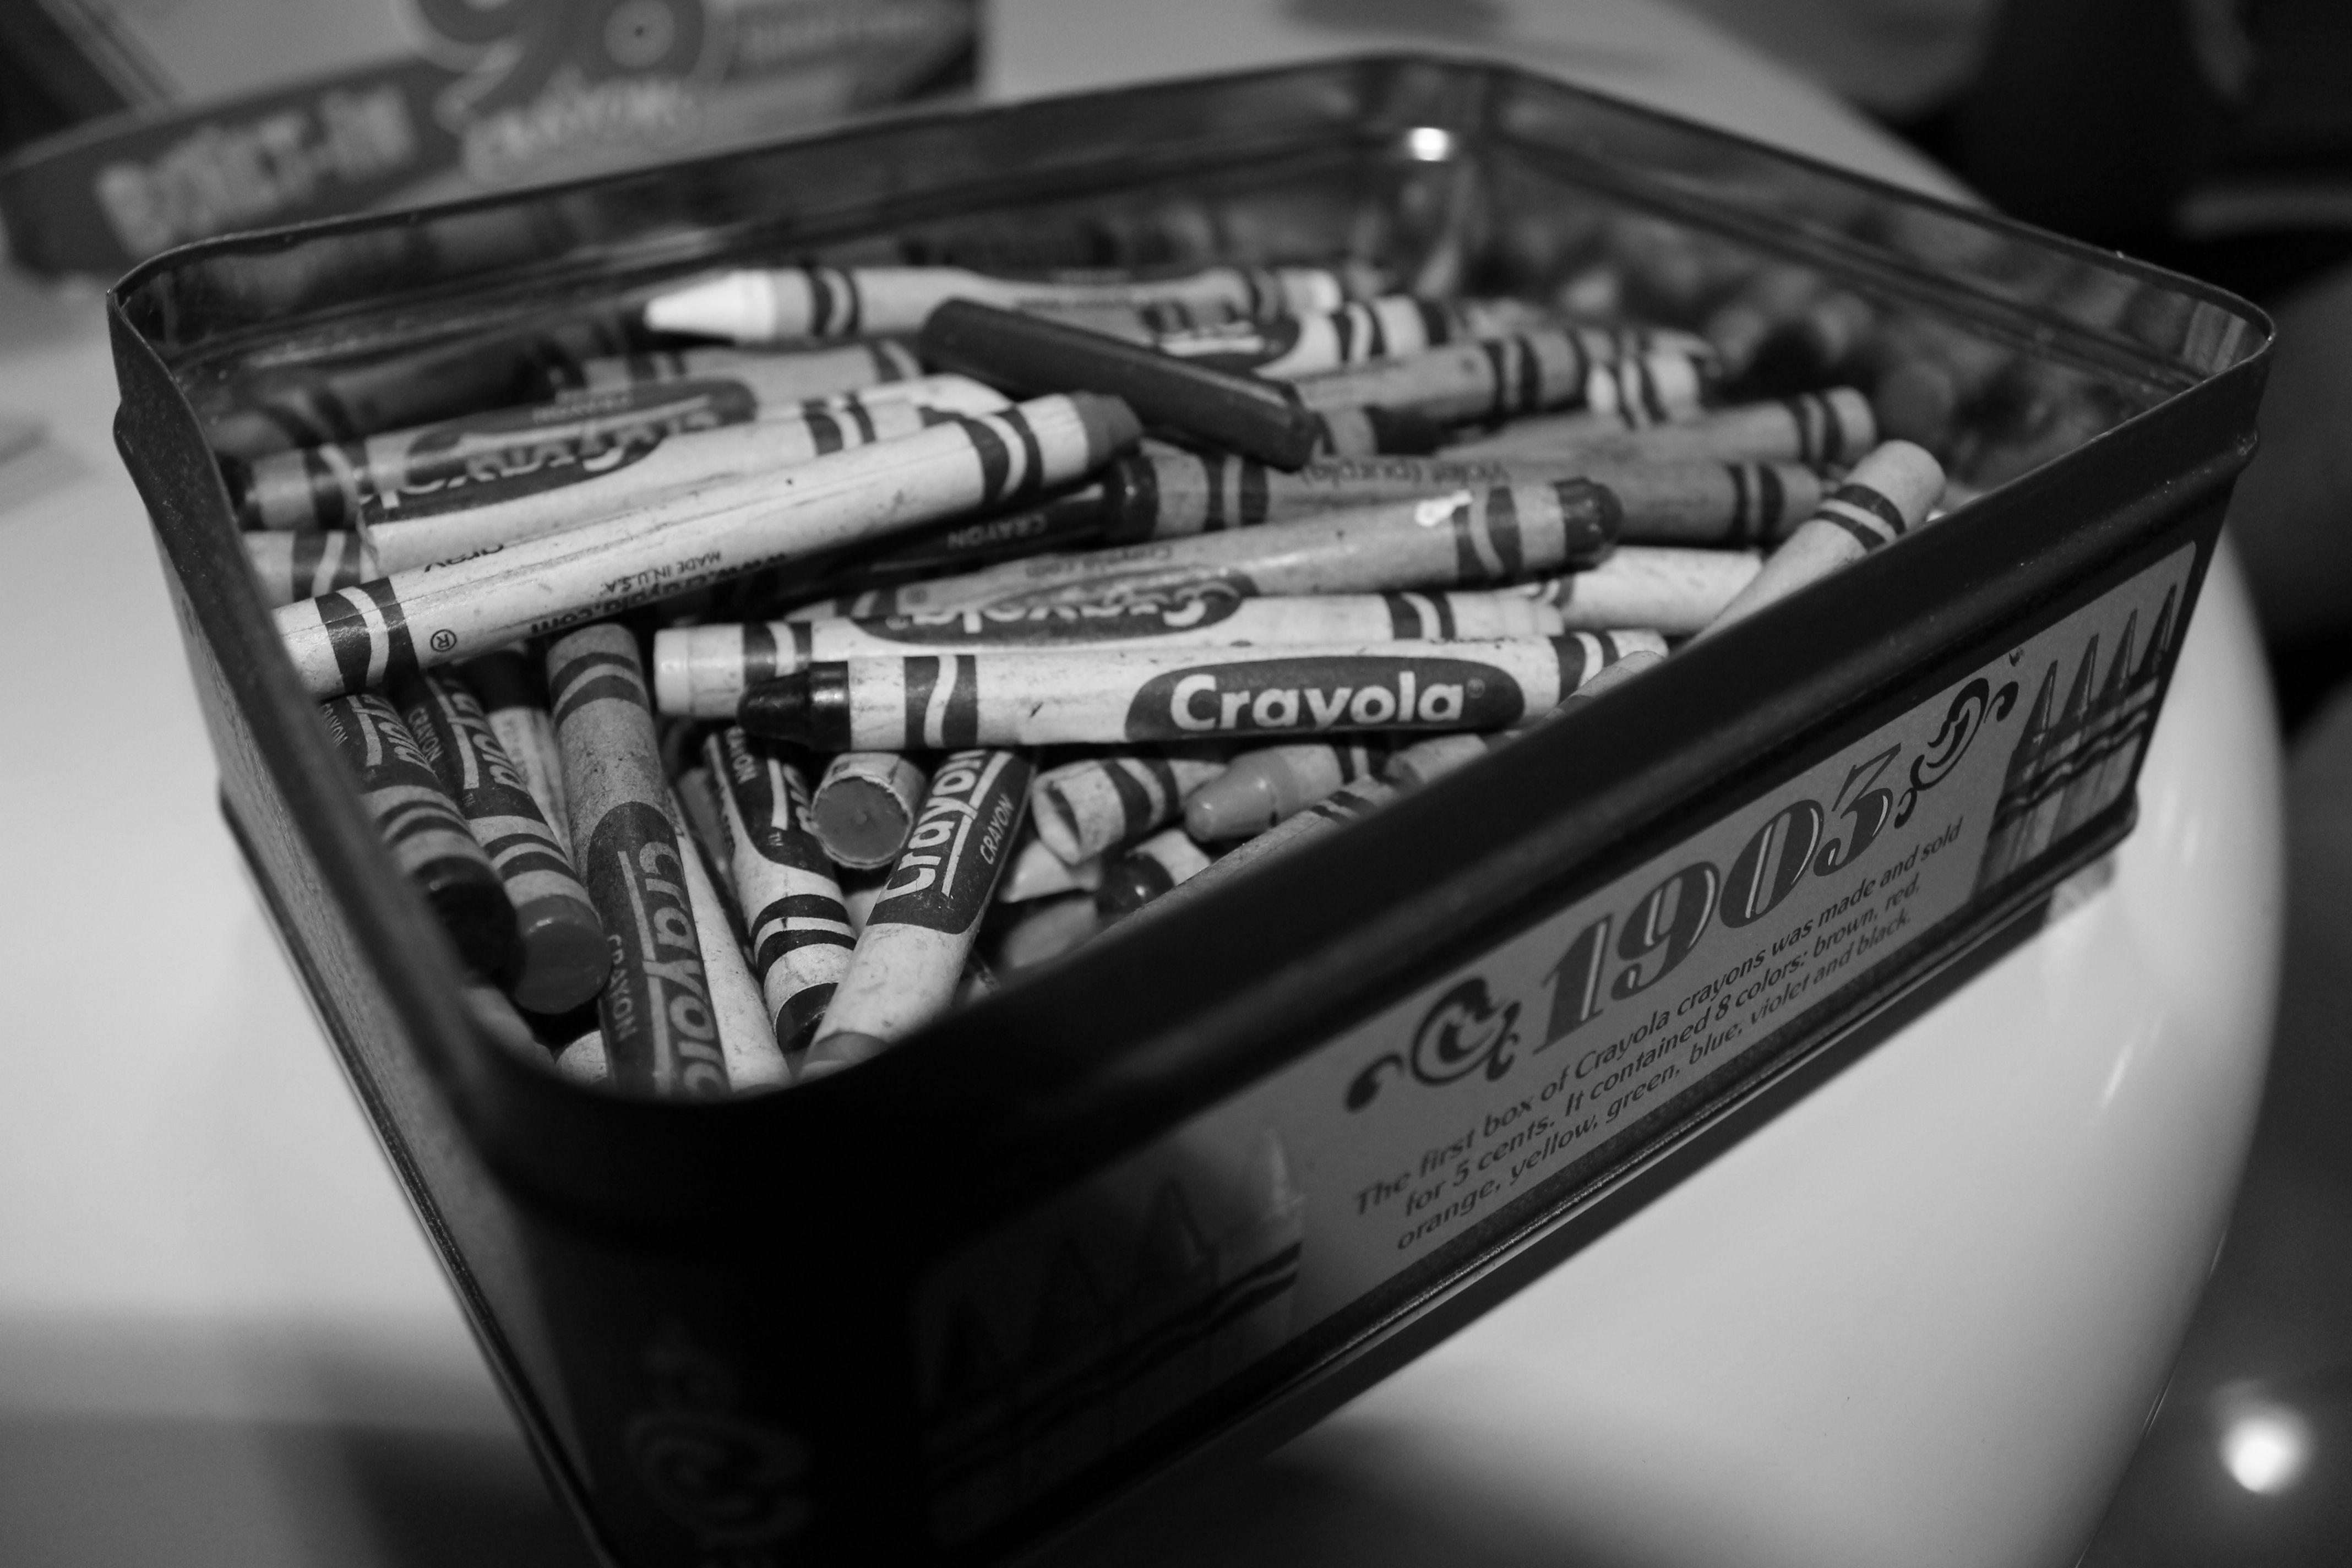 Monochrome Crayolas. (Taken with Canon EOS Rebel T3)